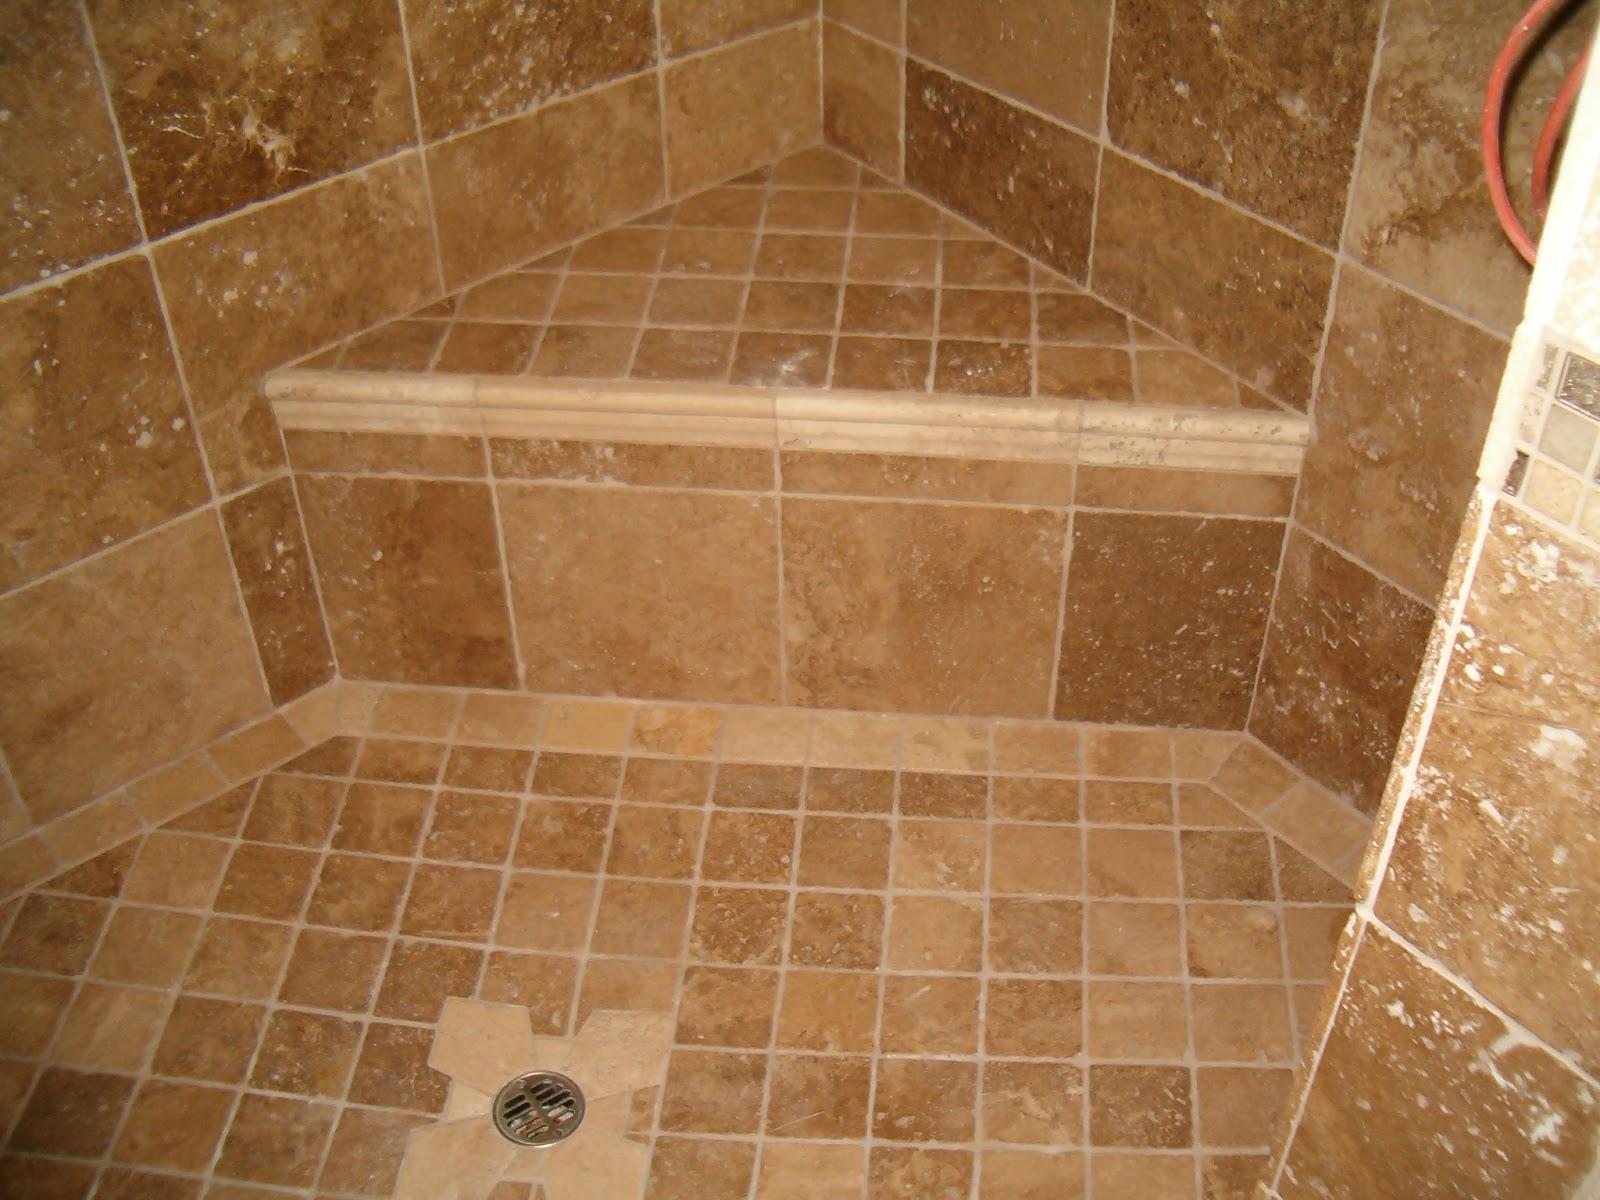 Tile Shower Design Ideas in shower shower with Walk In Shower Designs Pictures Tile Shower Pictures Ideas In 2013 Bathroom Designs Ideas